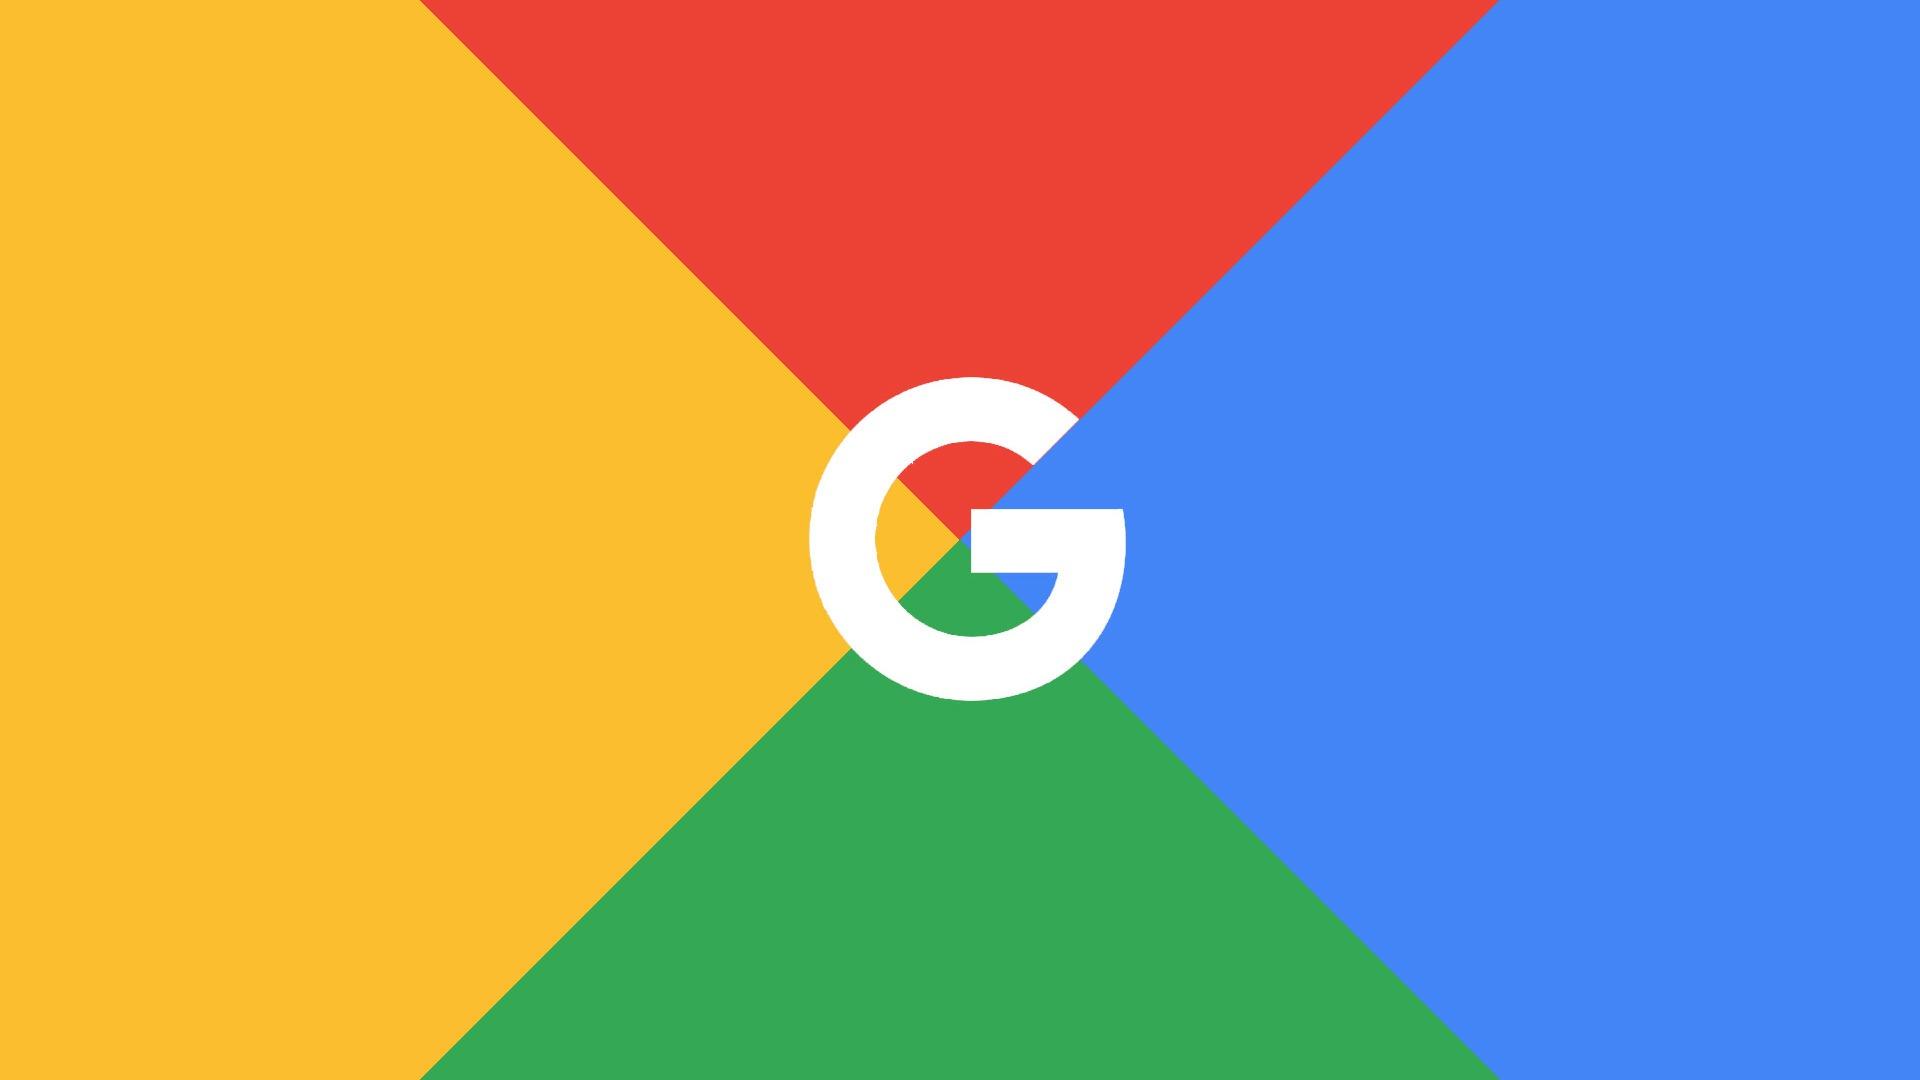 Google Screensavers